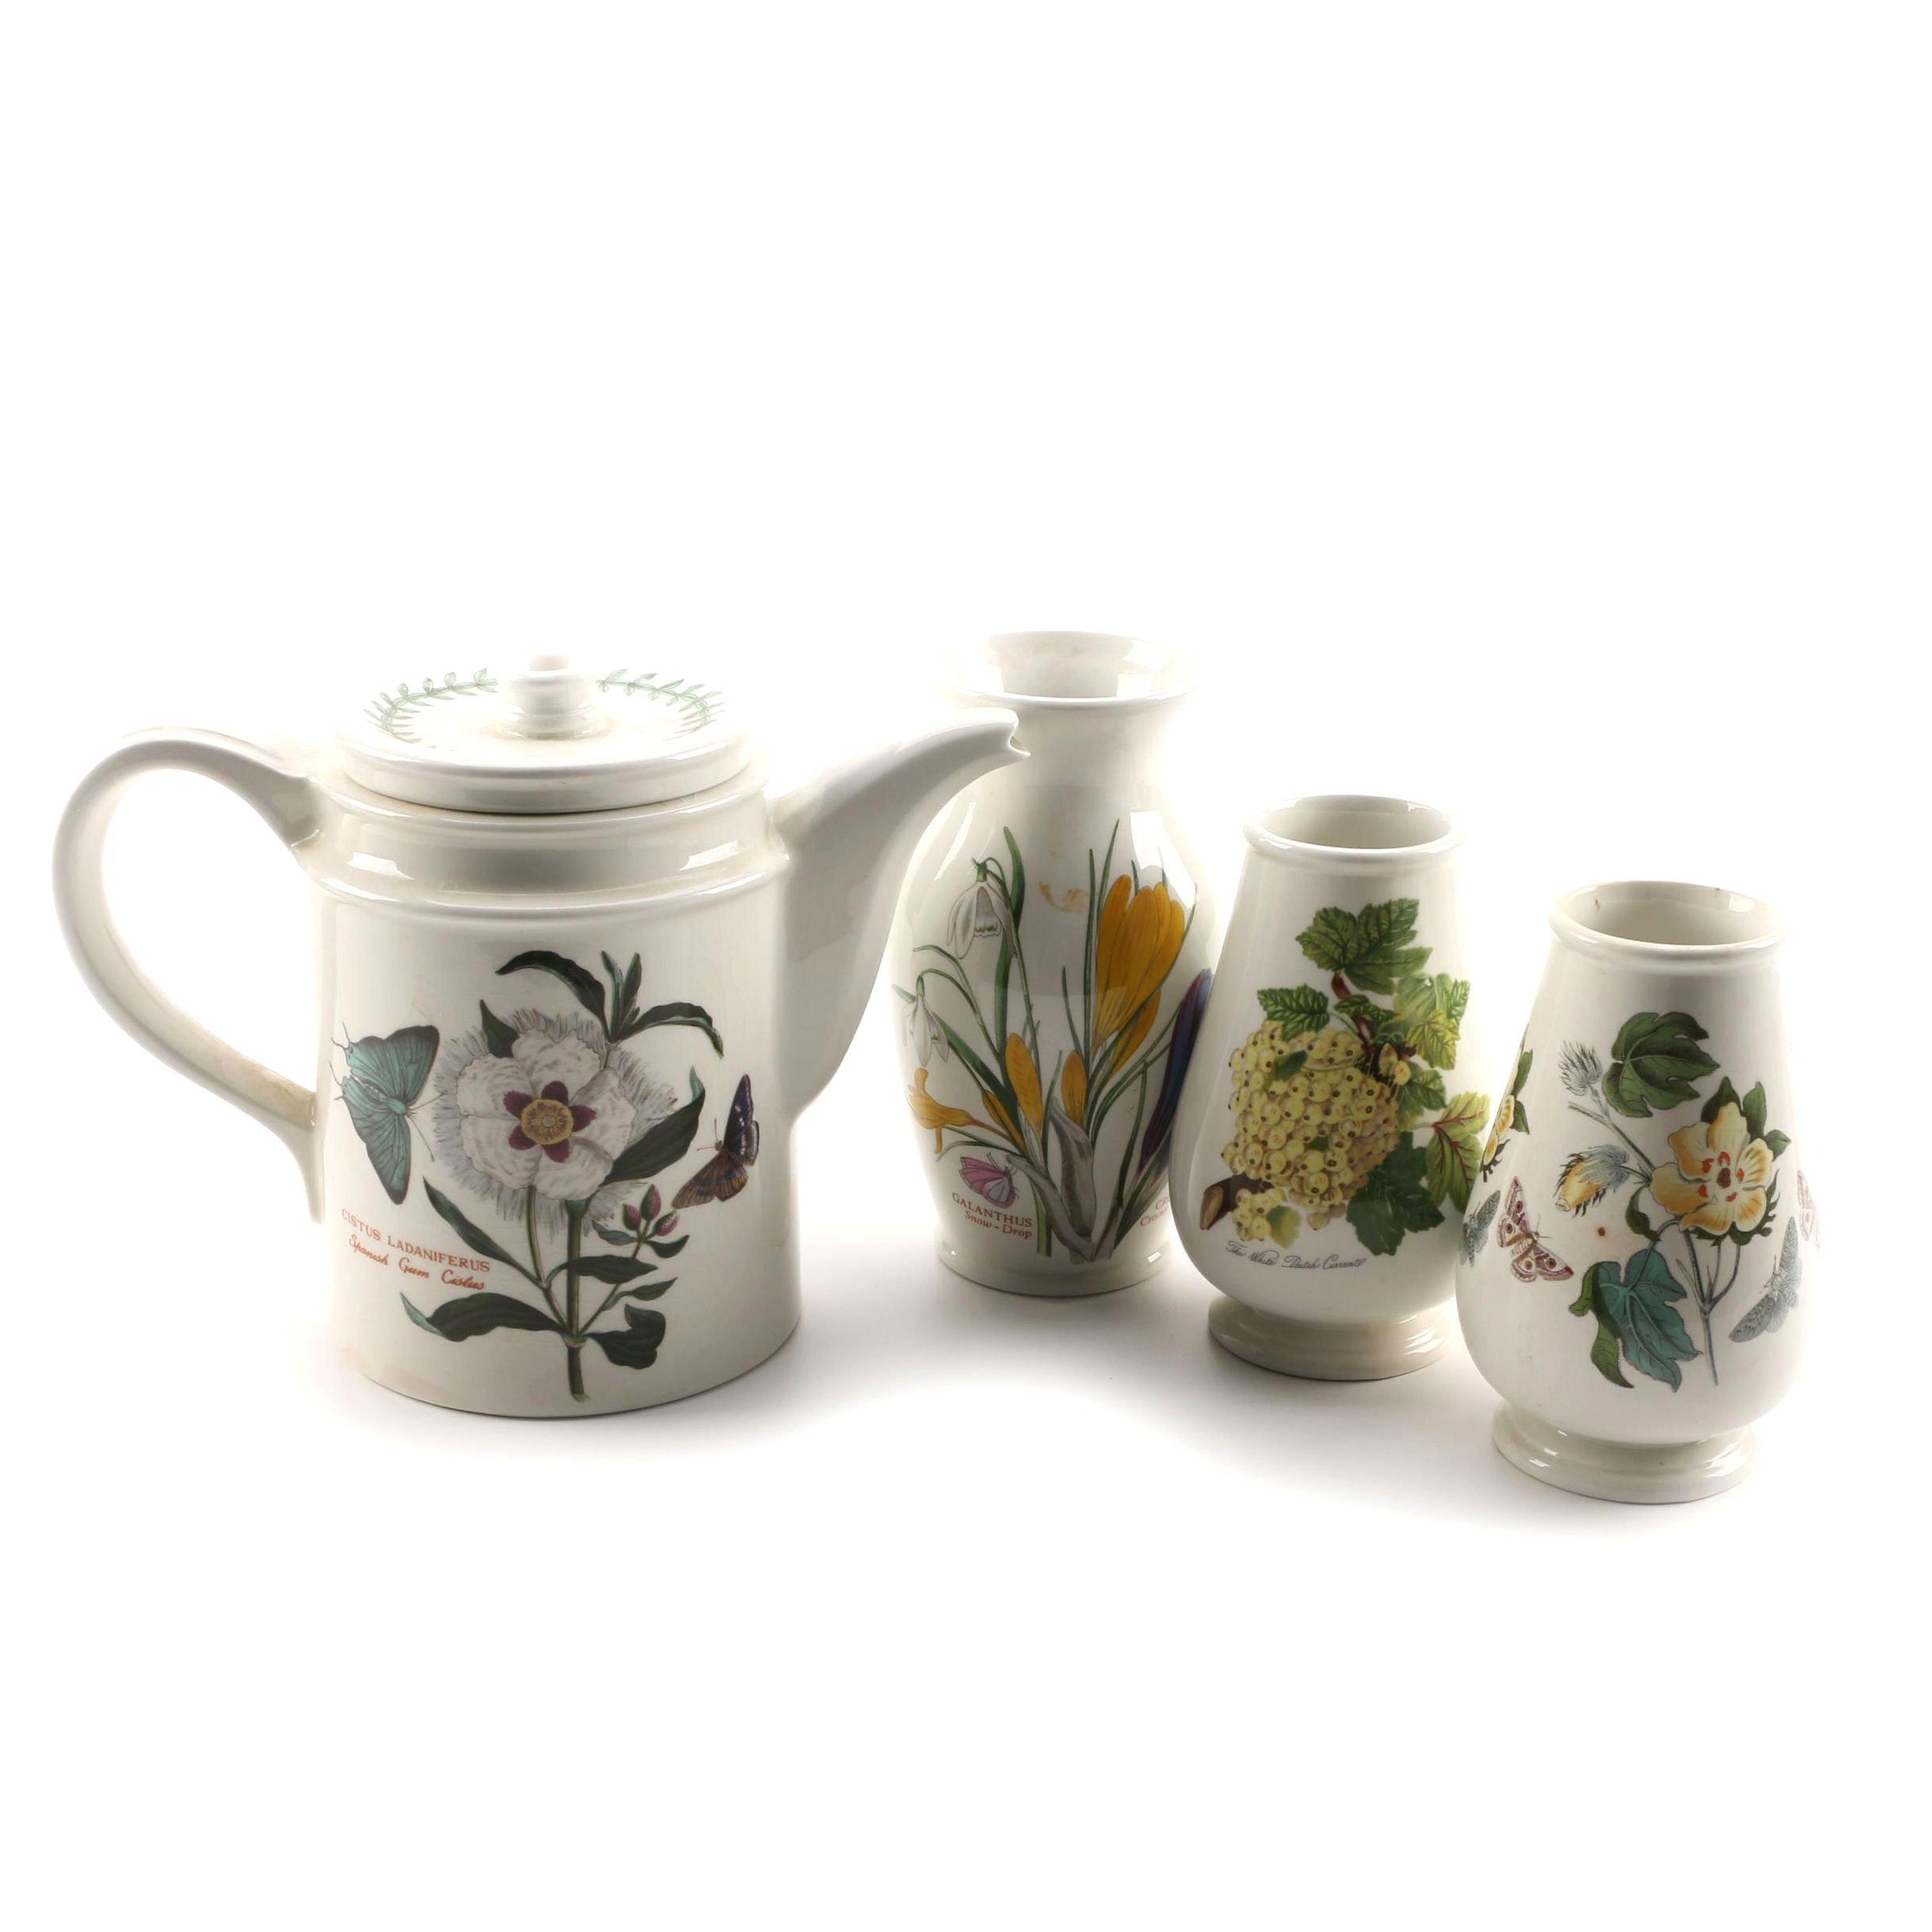 "Portmeirion ""Botanic Garden"" Teapot and Vases"